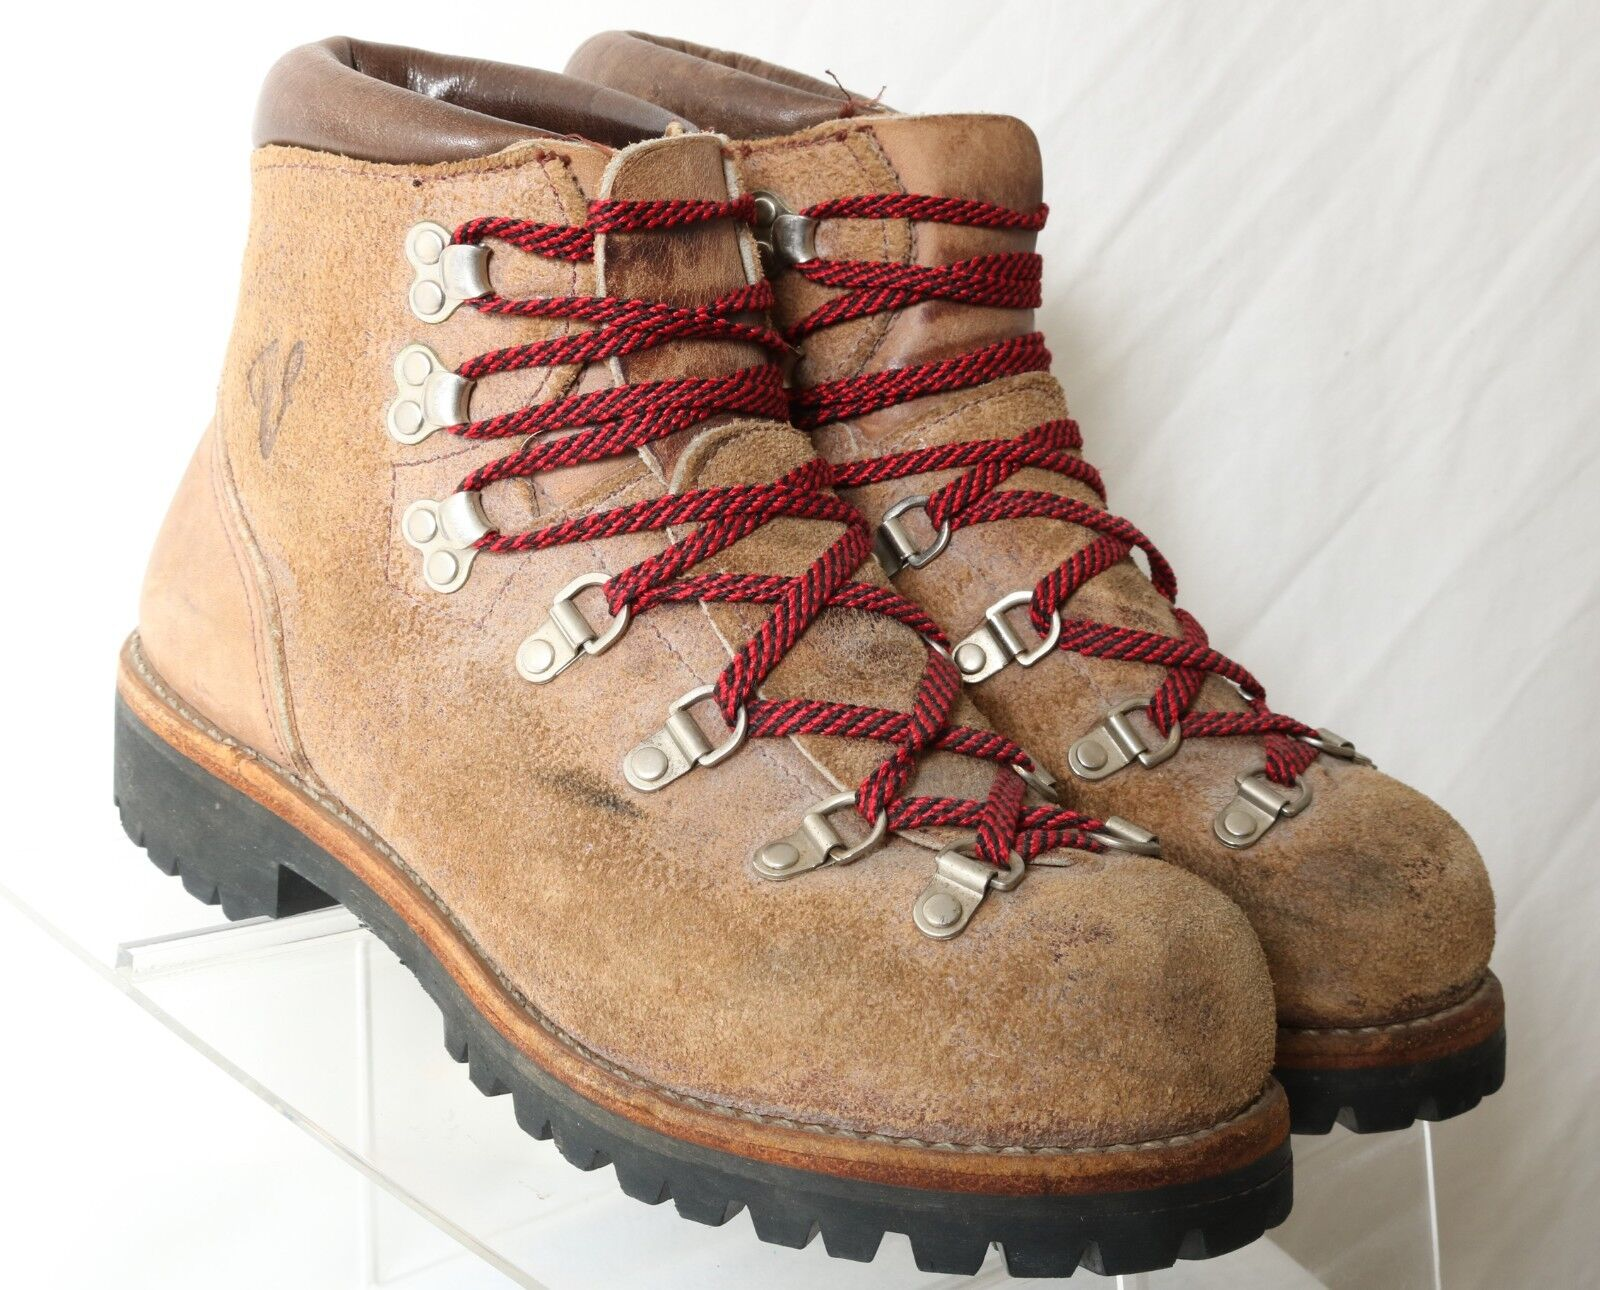 Vintage Vasque Brown 1970's Mountaineering Hiking Boot 09404 USA Men US 7.5C